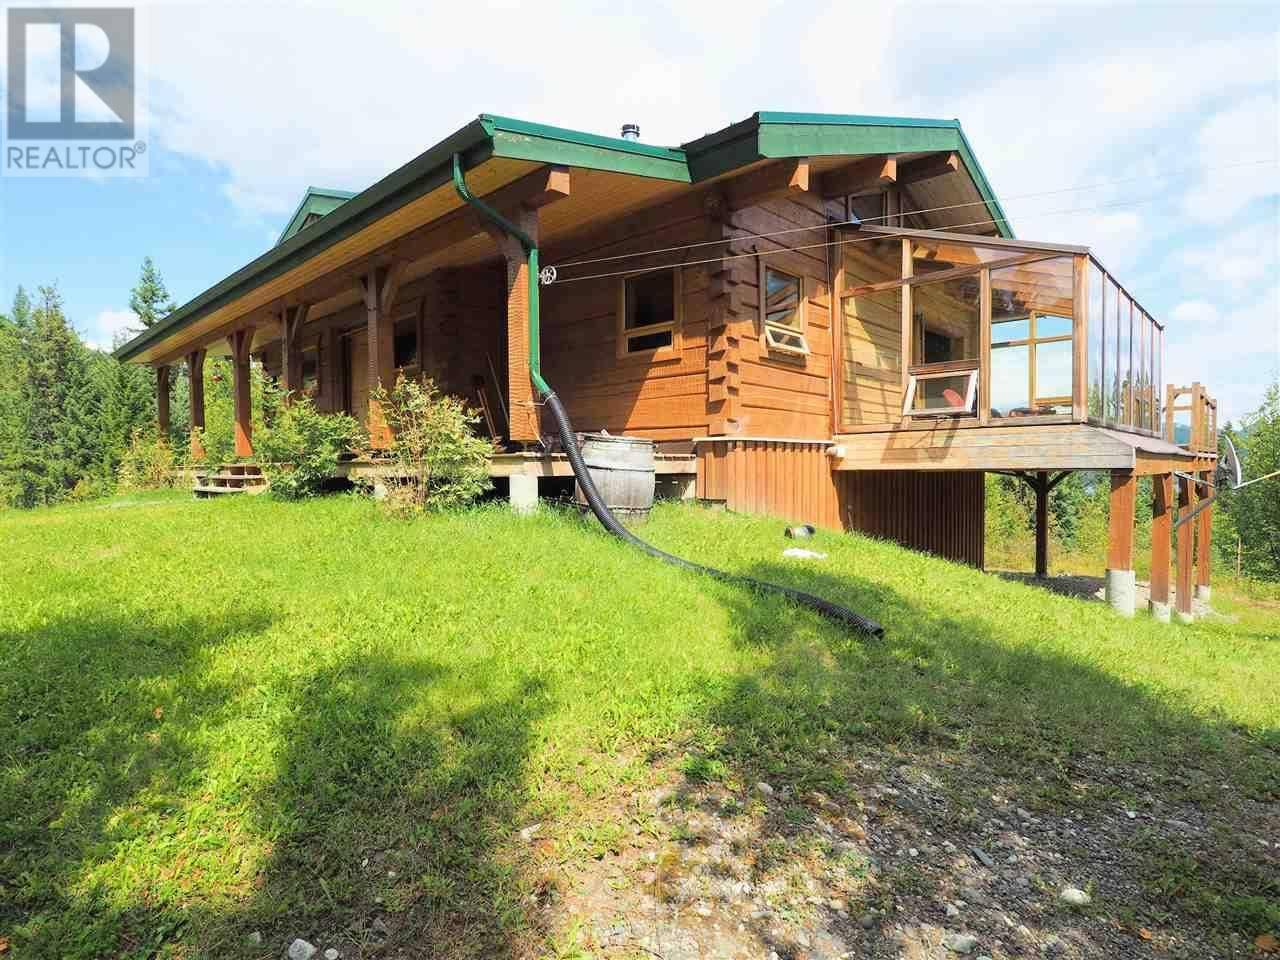 House for sale at 4050 Canim-hendrix Lake Rd Canim Lake British Columbia - MLS: R2396282